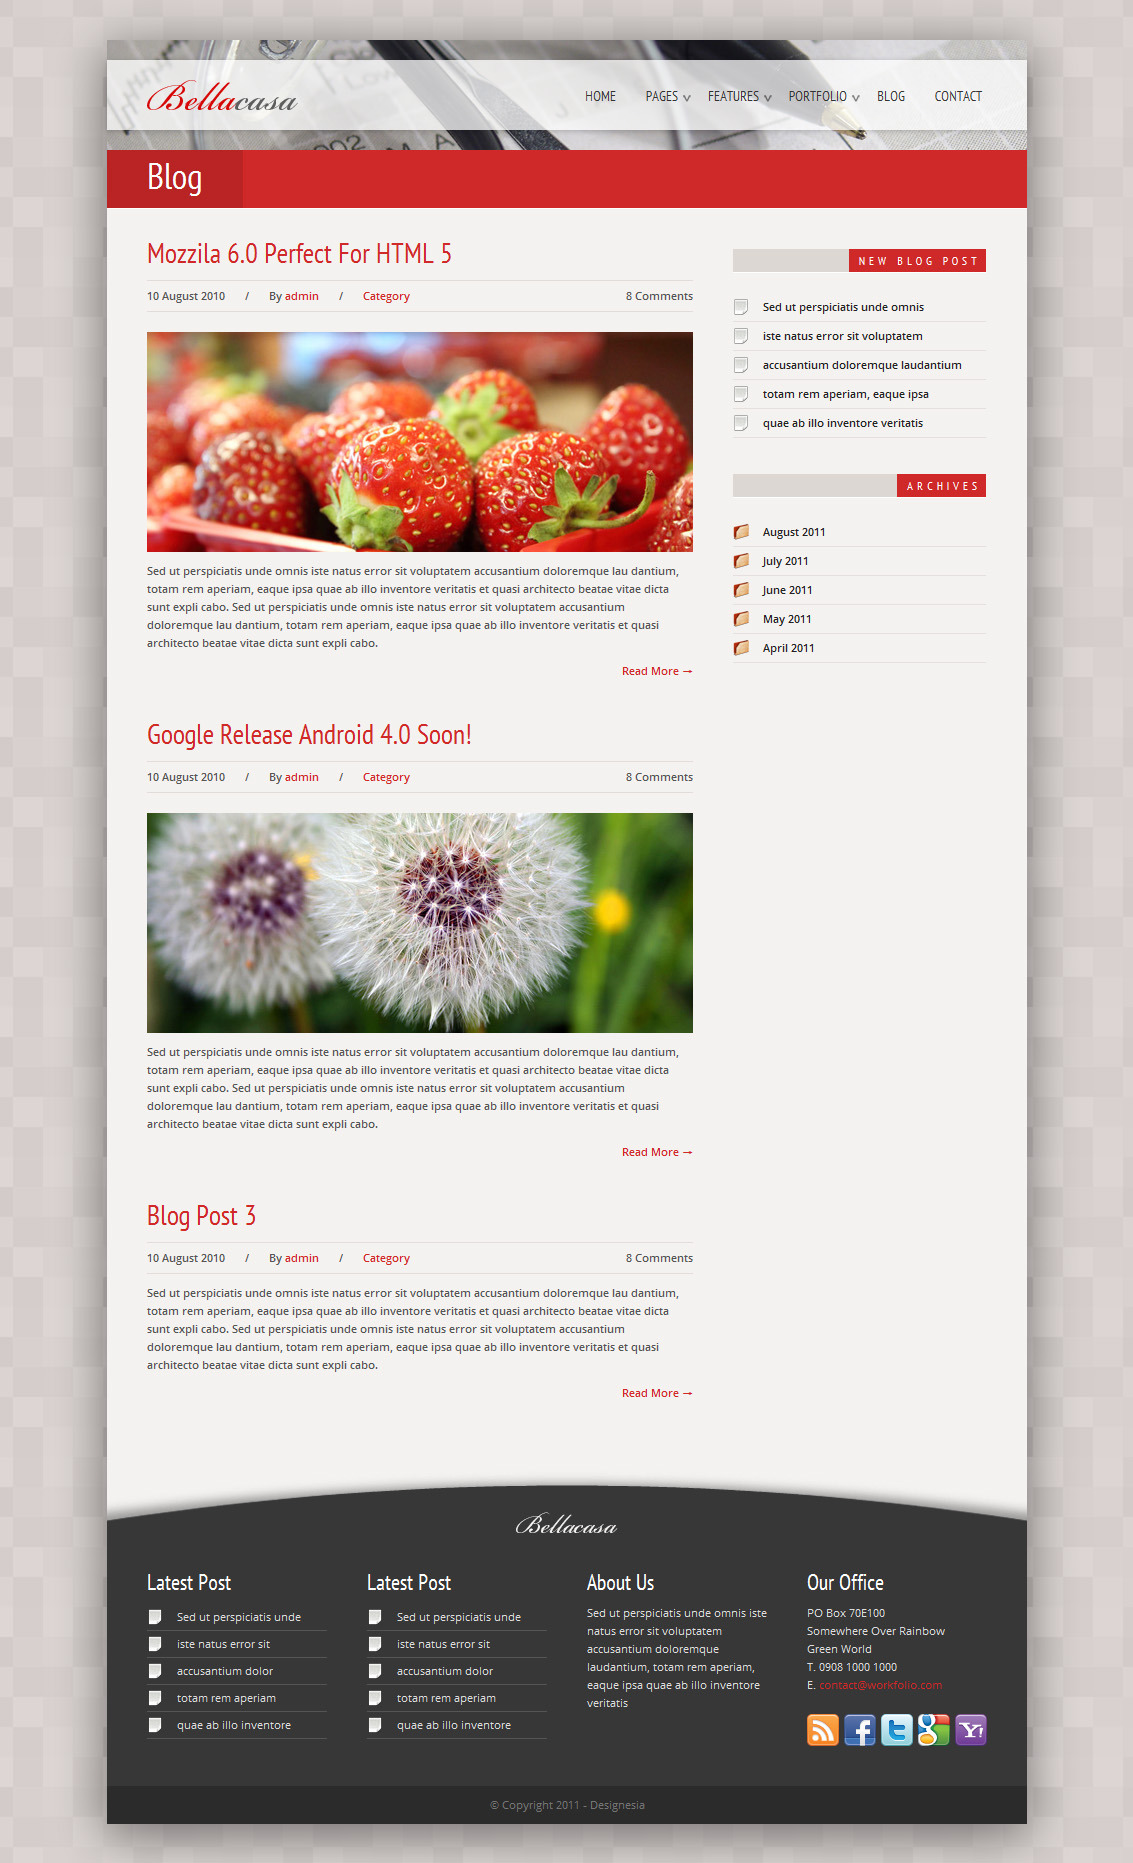 Bellacasa - Clean & Modern Website Template